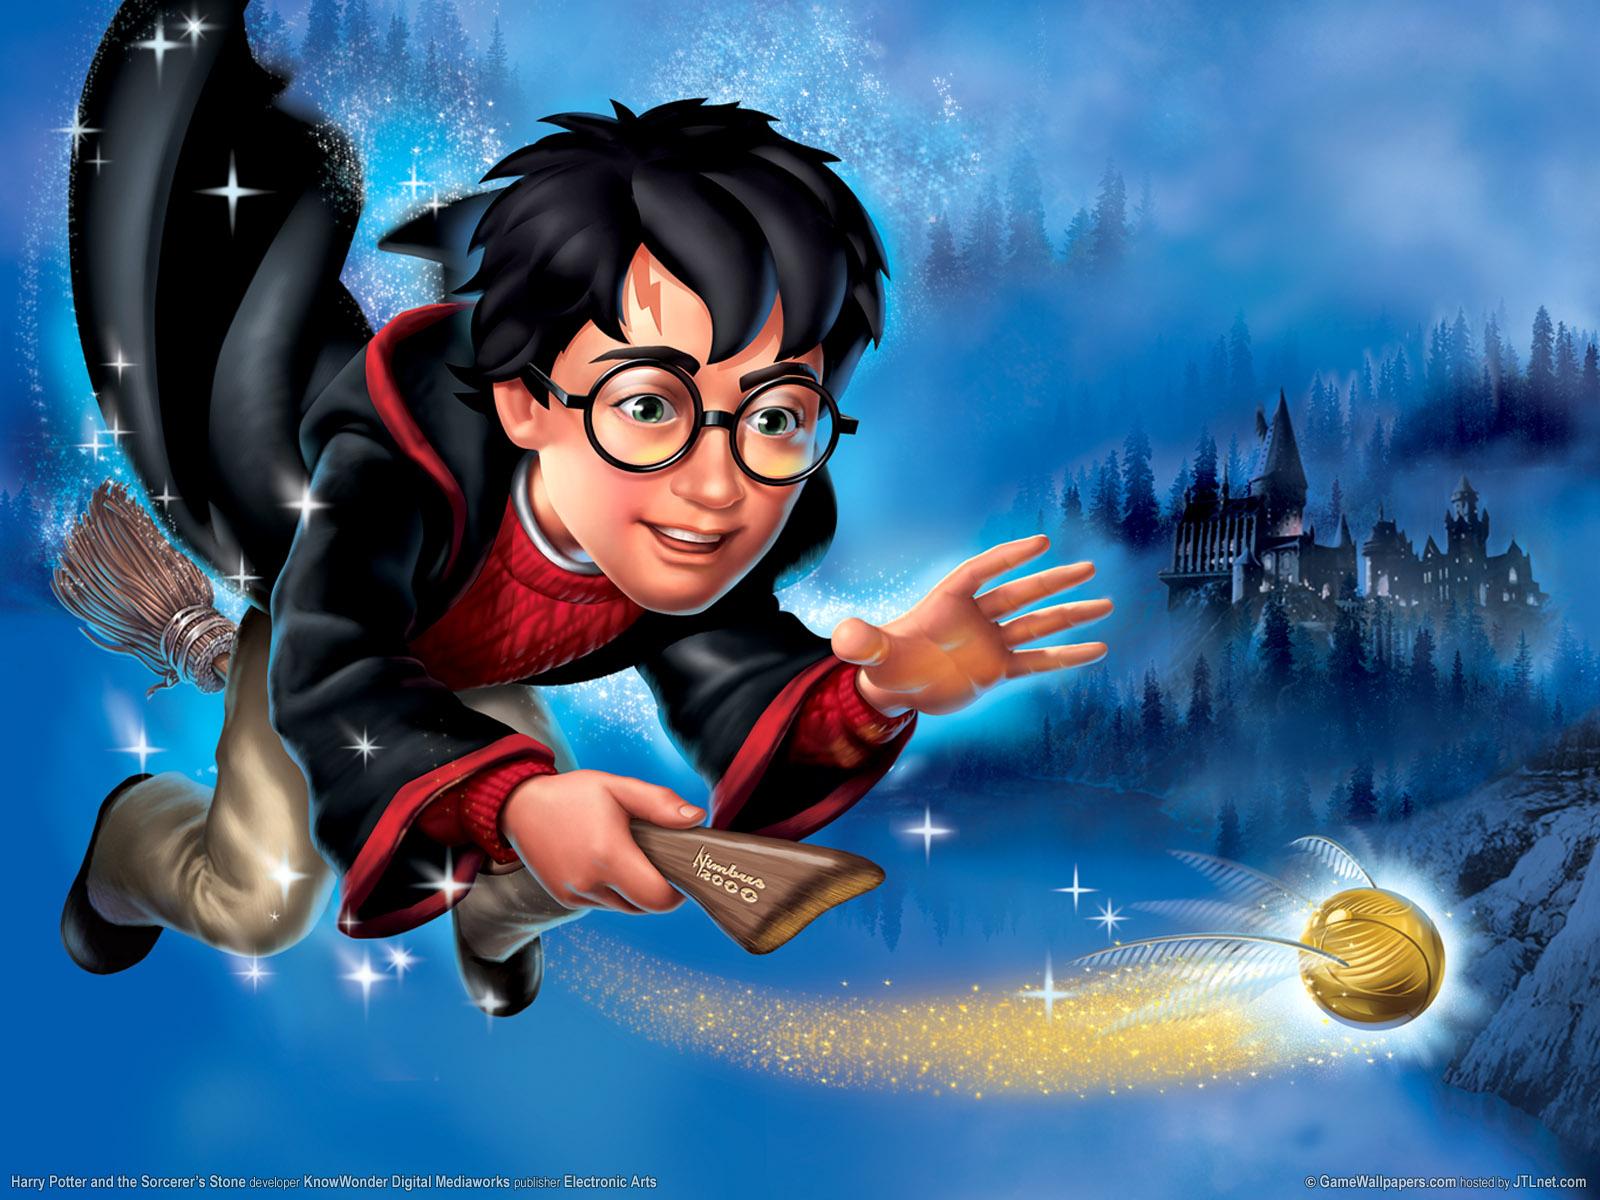 Harry Potter Cartoon Wallpaper Cartoon Images 1600x1200